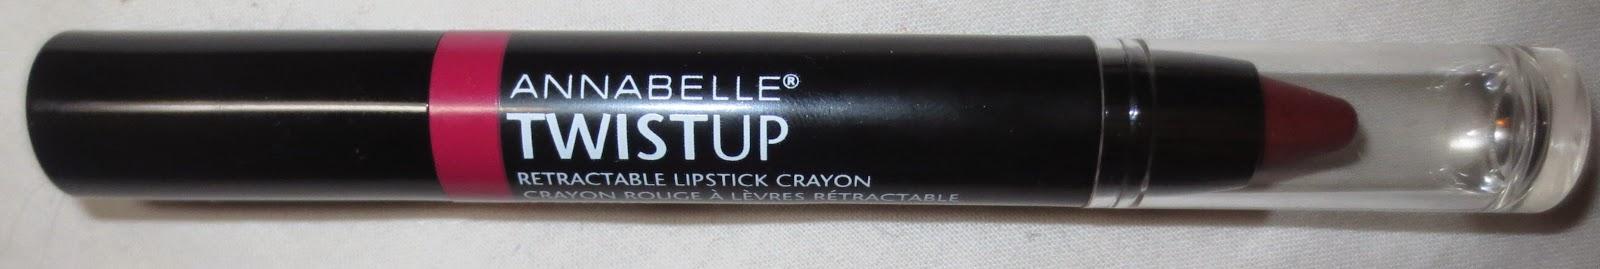 Annabelle TwistUp Retractable Lipstick Crayon in Cherry